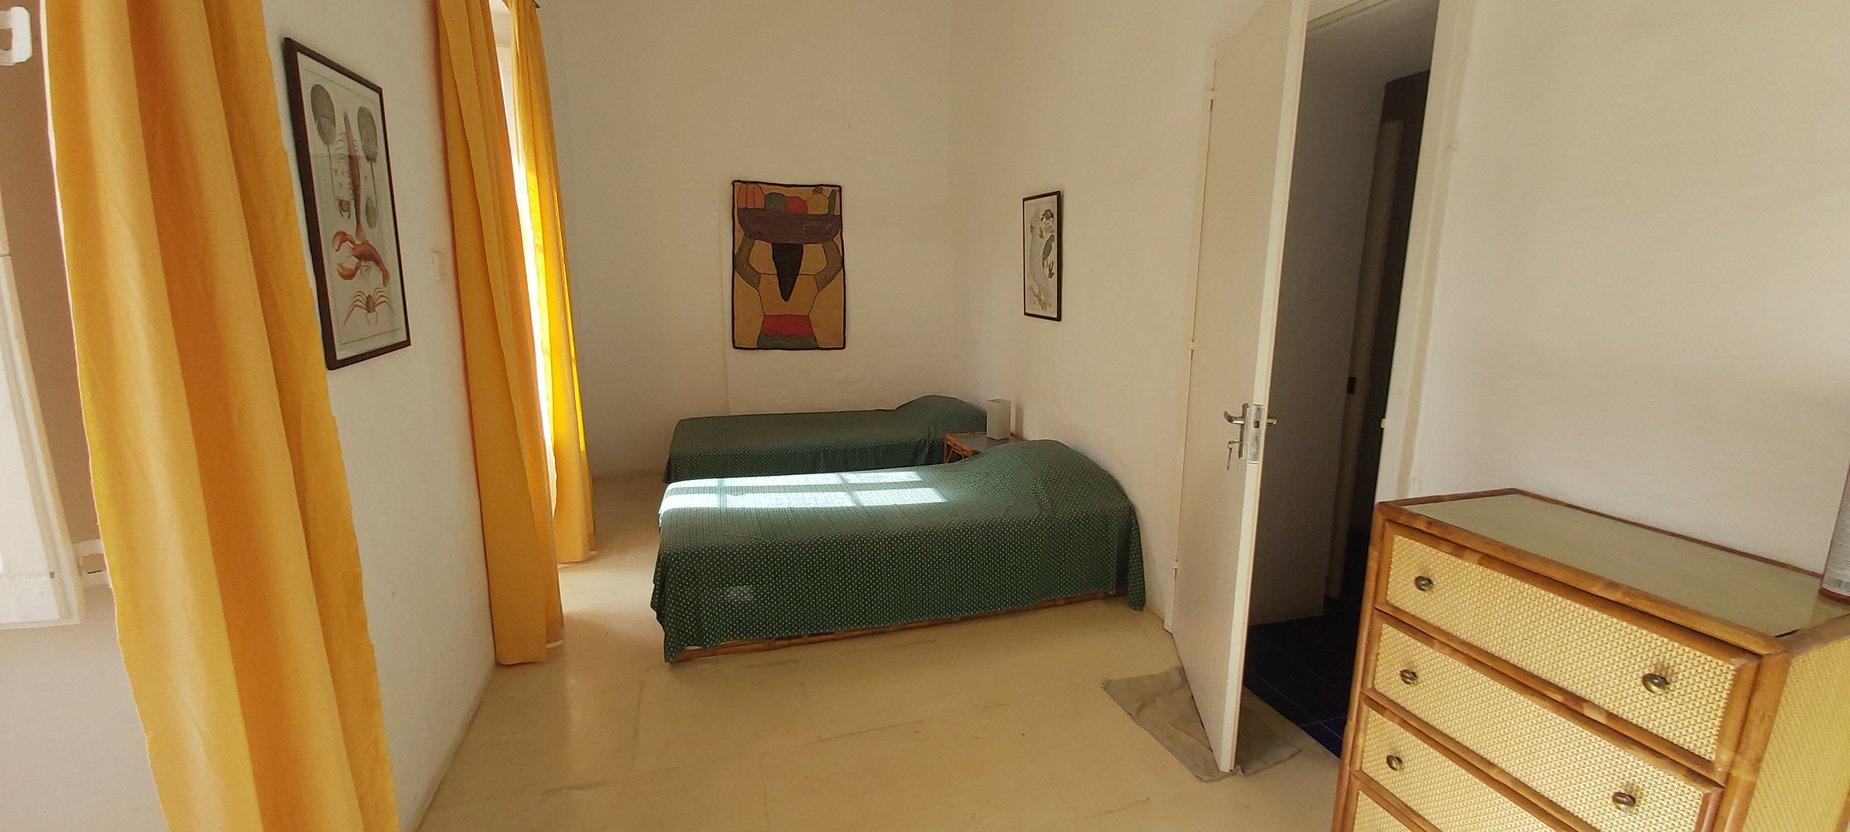 5 bed Town House For Sale in Lija, Lija - thumb 17